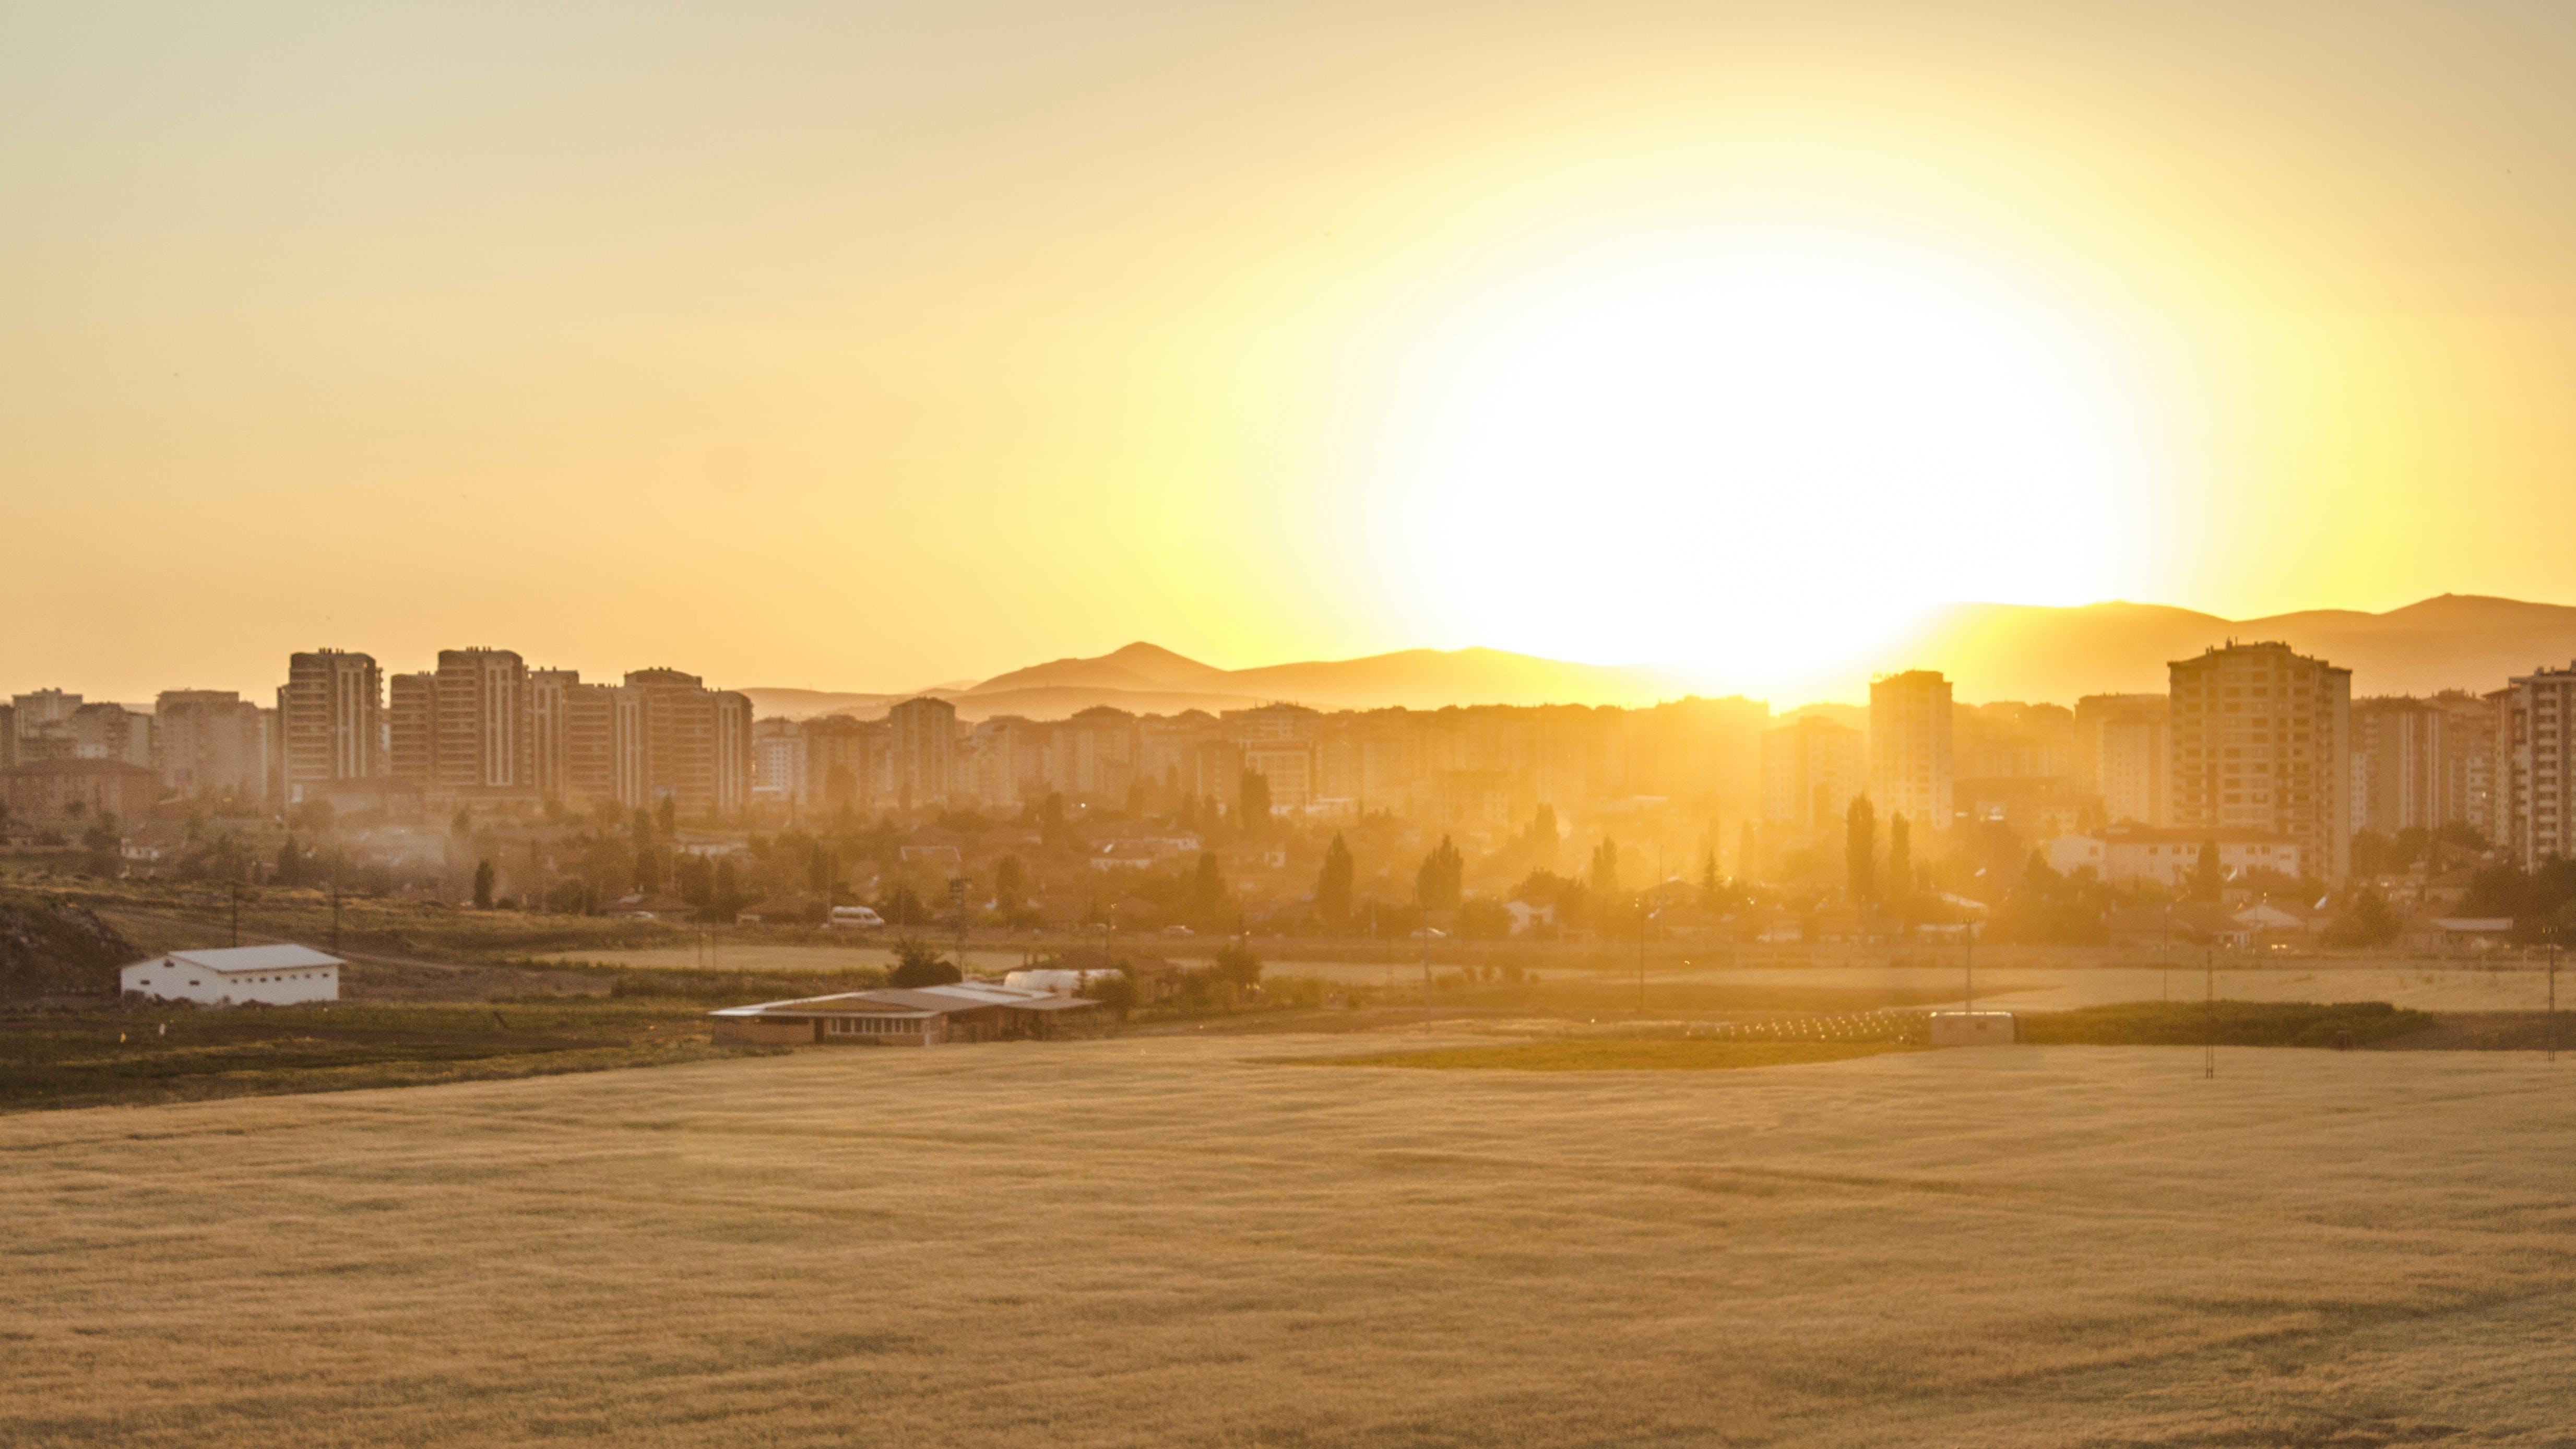 Free stock photo of city, sunset, field, yellow sun